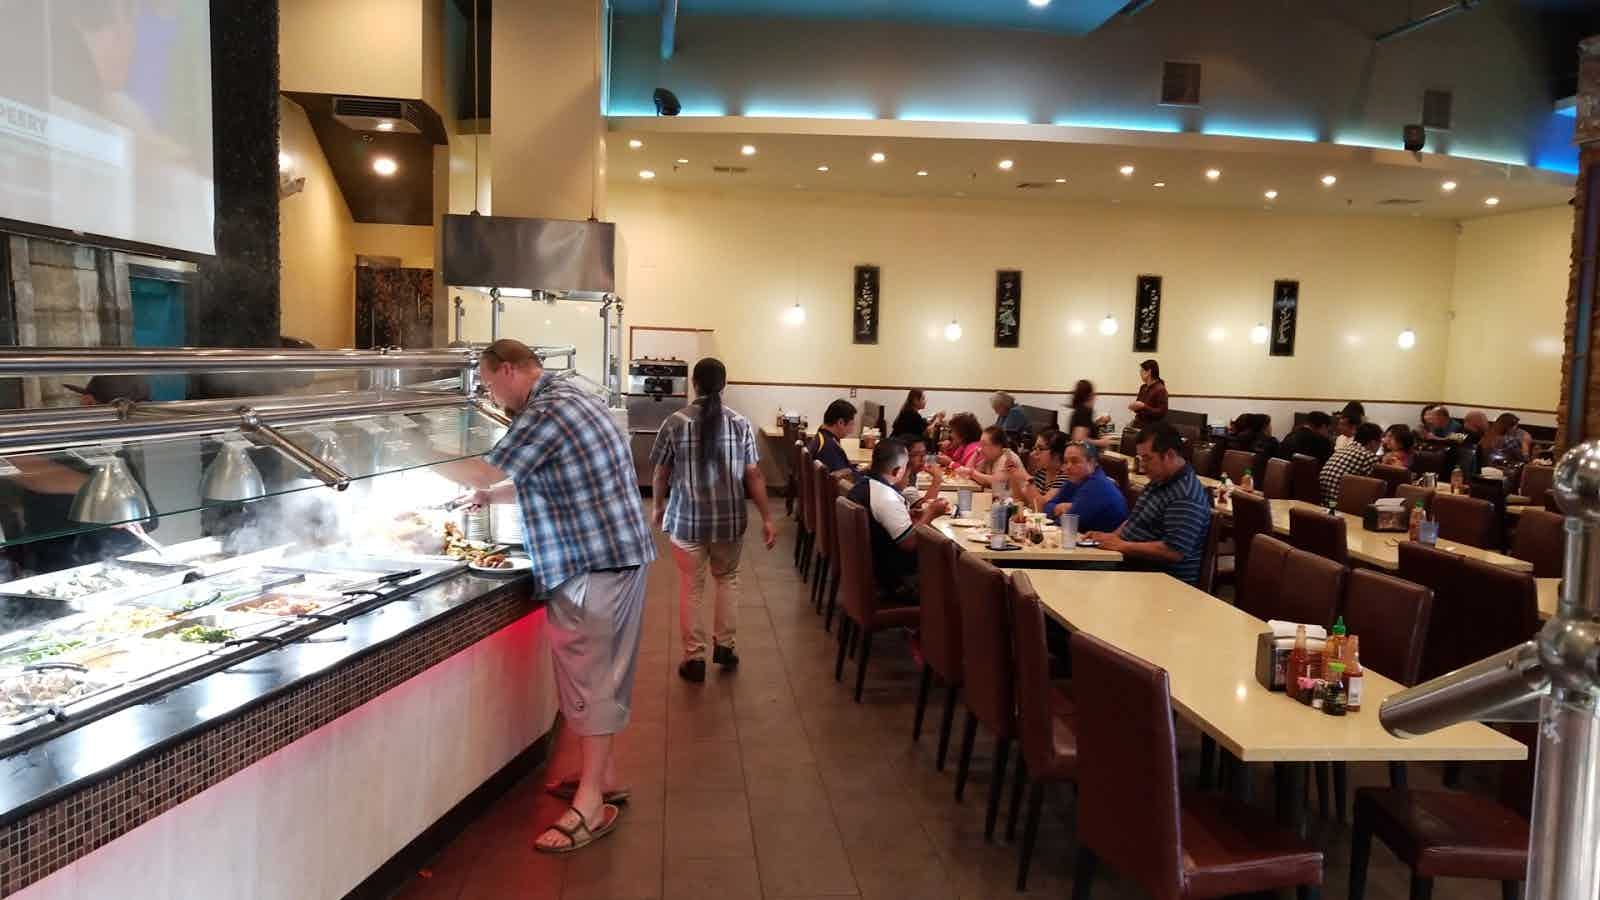 Awesome Buffet Star Redlands Restaurant Review Zagat Download Free Architecture Designs Intelgarnamadebymaigaardcom